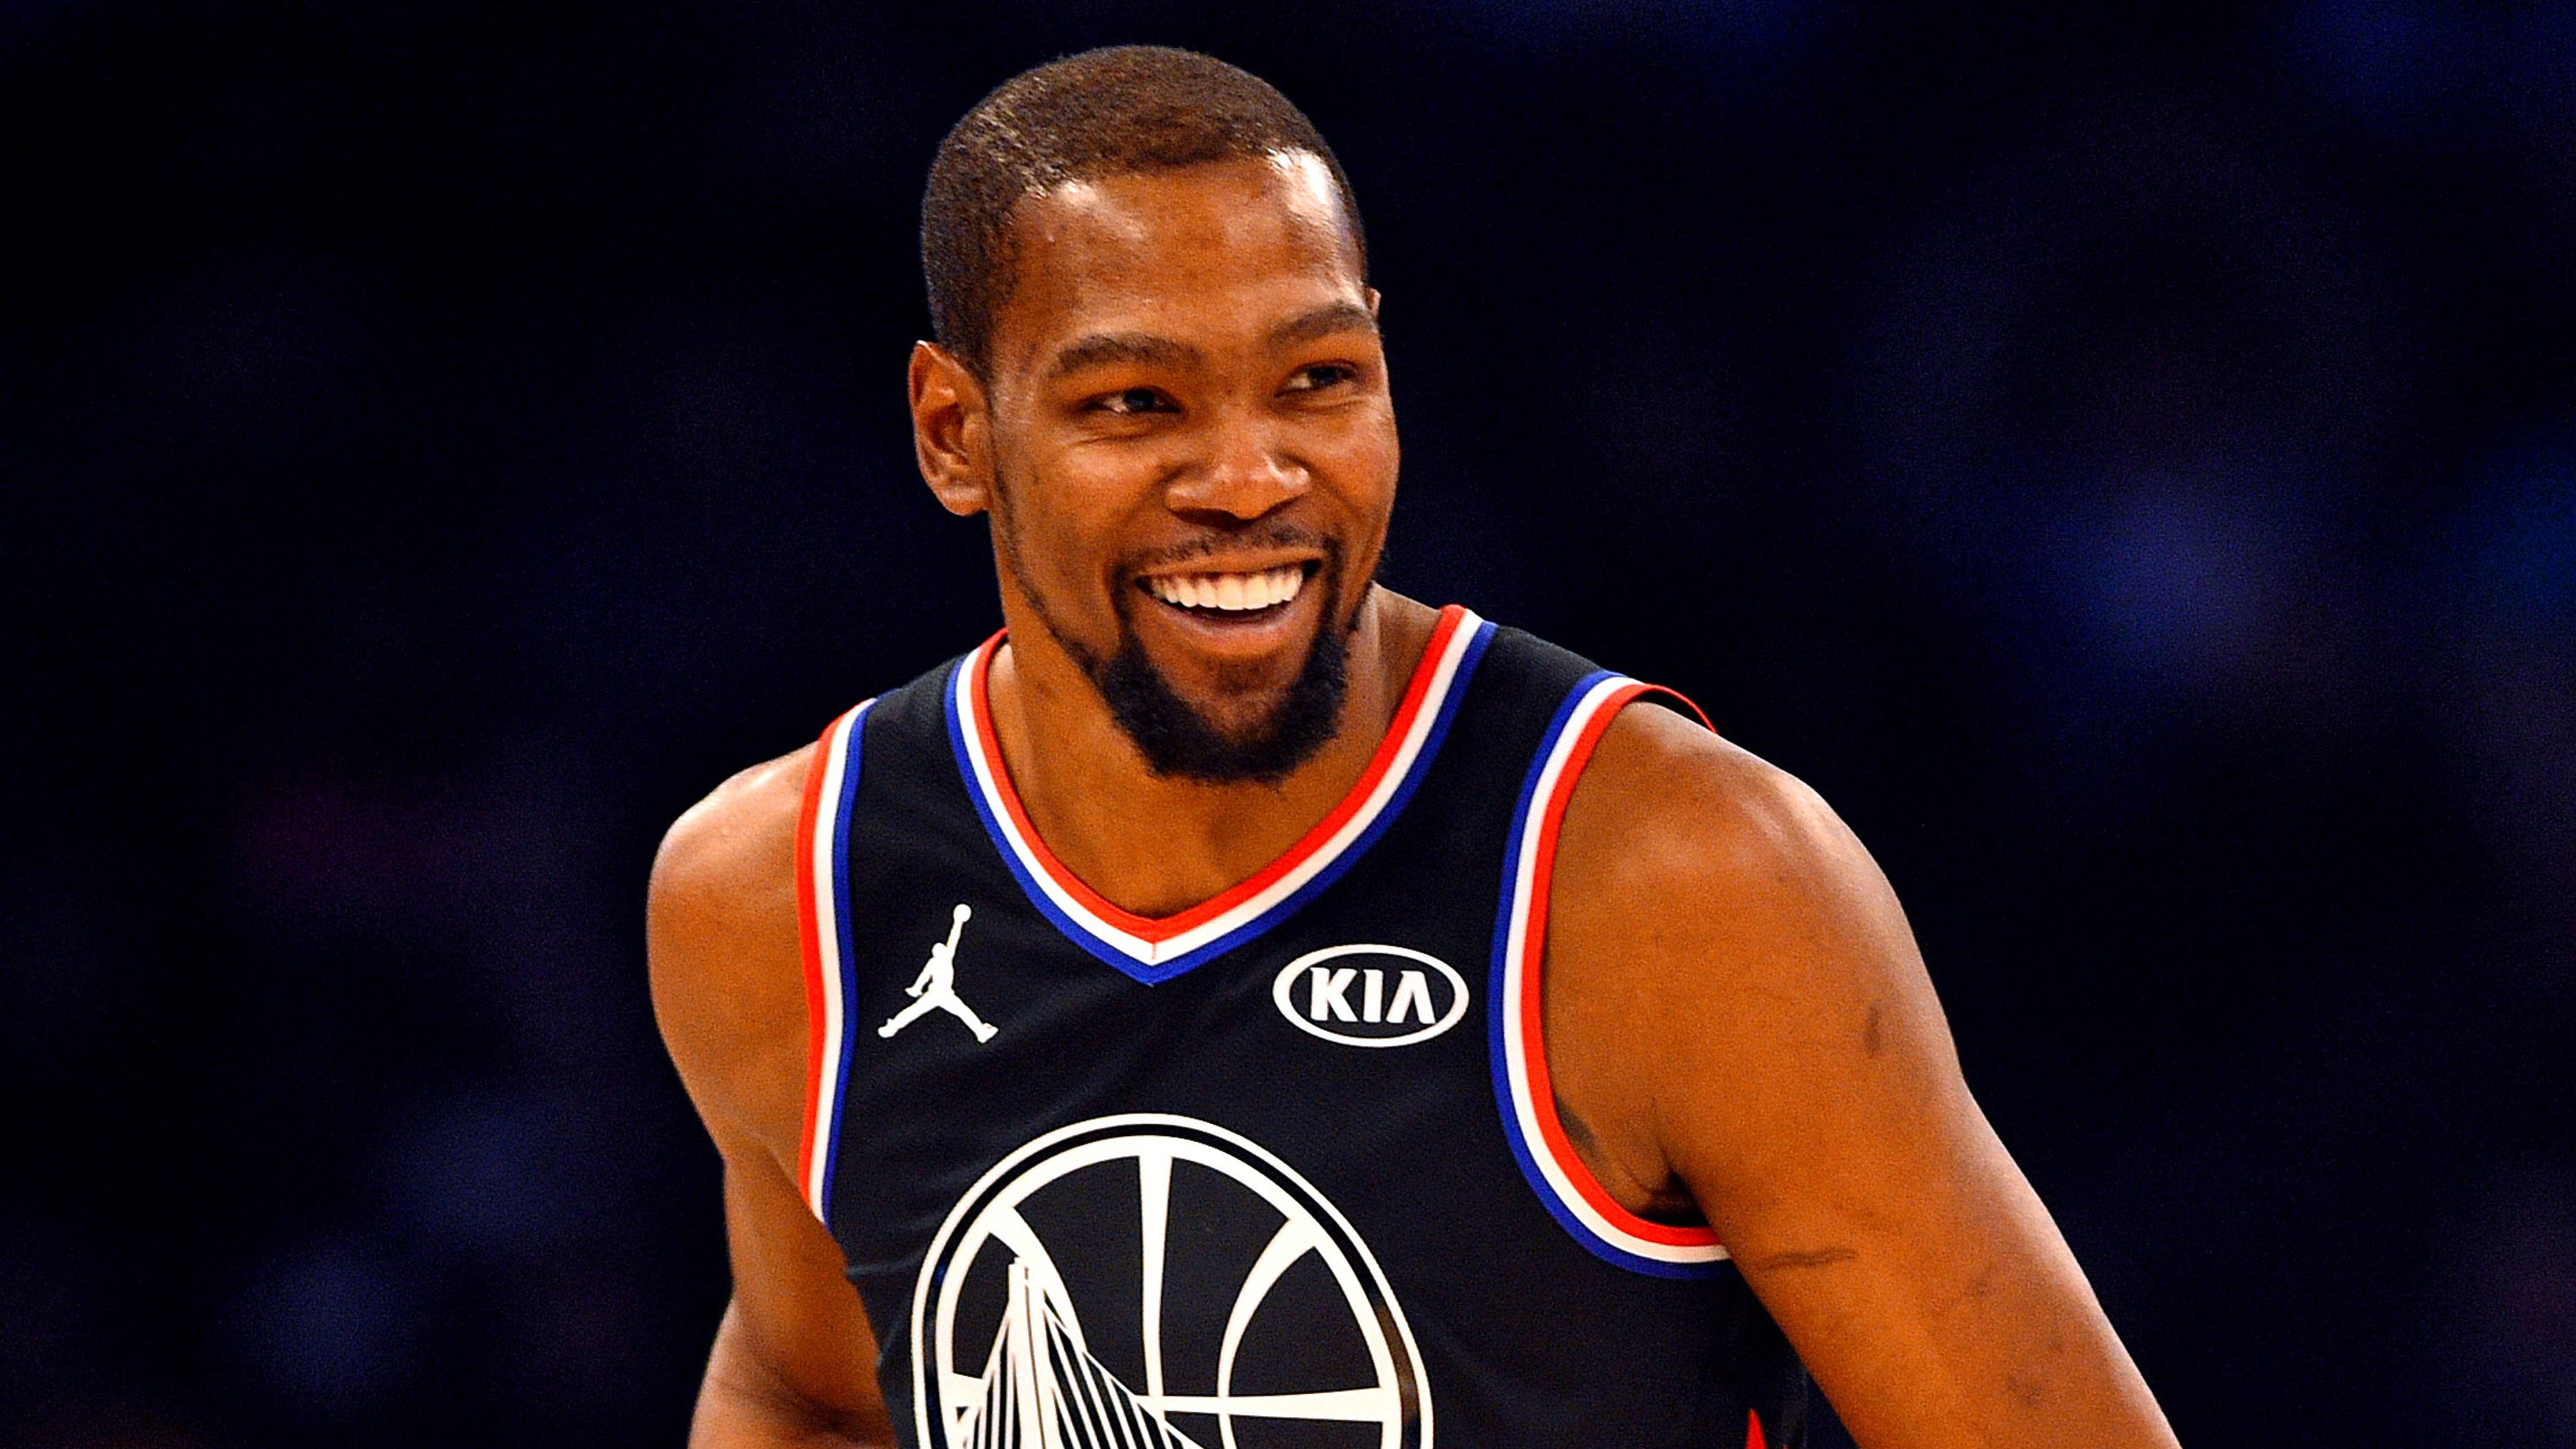 5d844638a856 Kevin Durant pads already-impressive résumé with another All-Star MVP